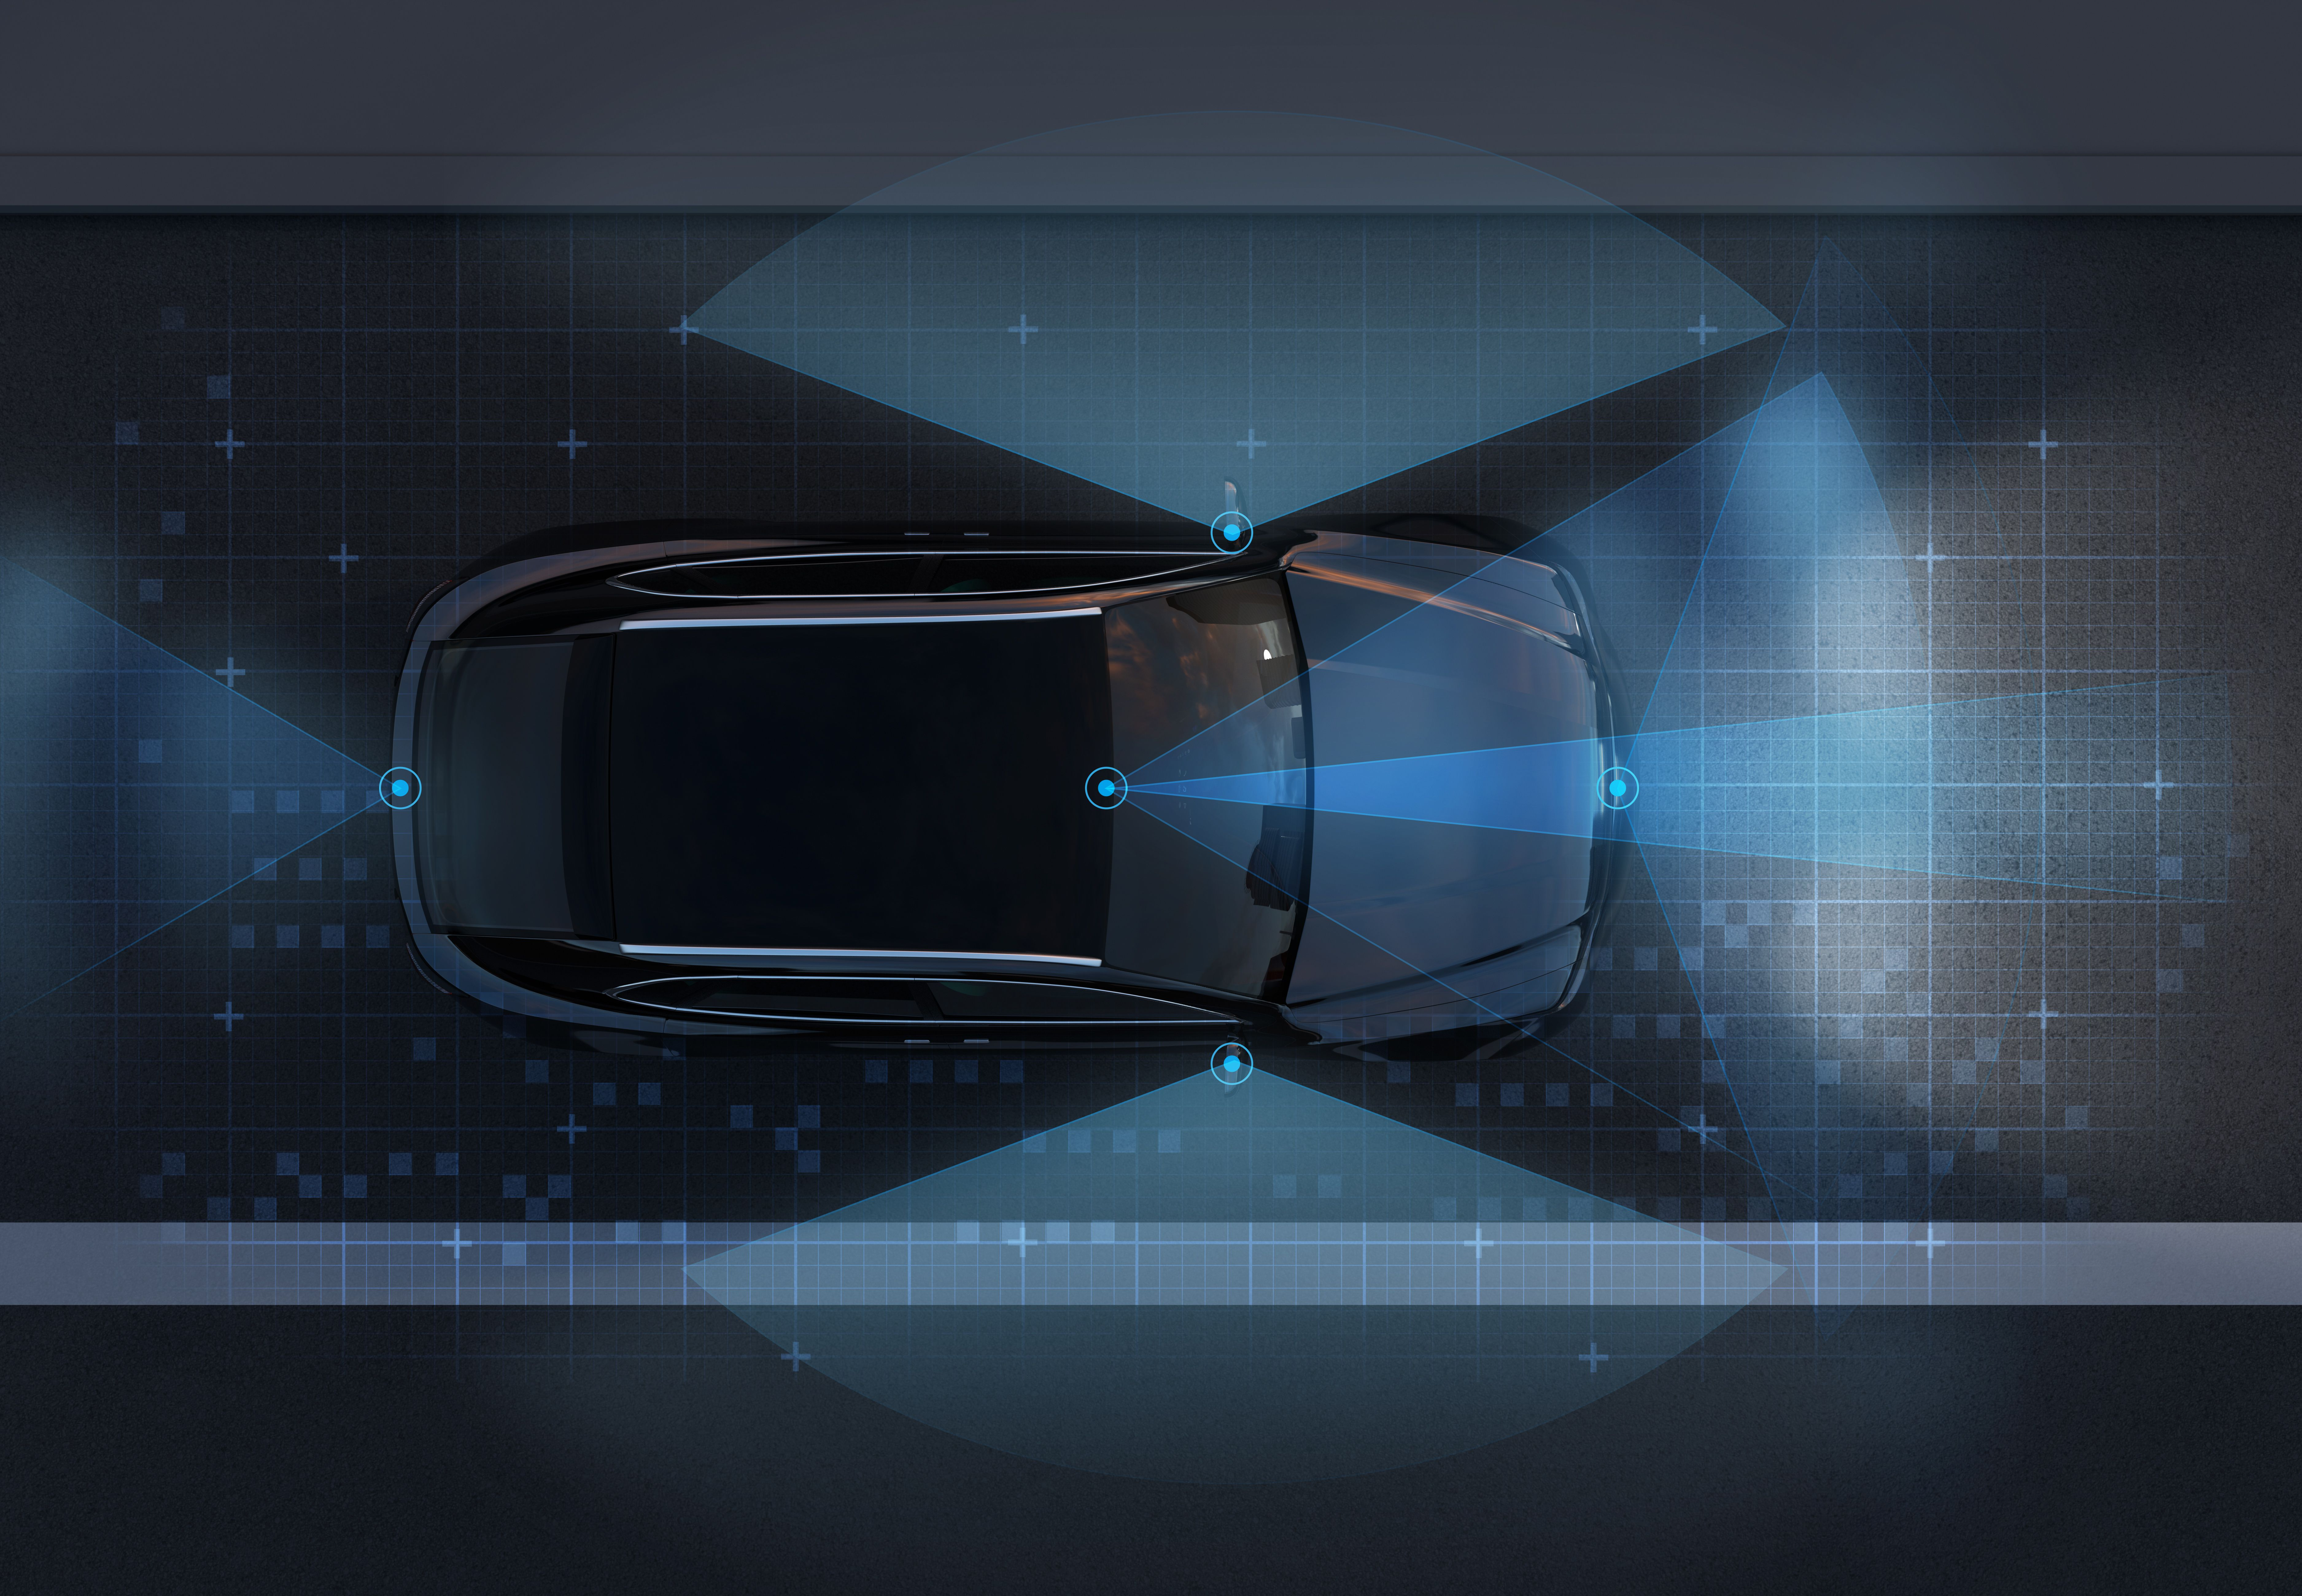 A diagram of an autonomous vehicle showing how the sensors work.